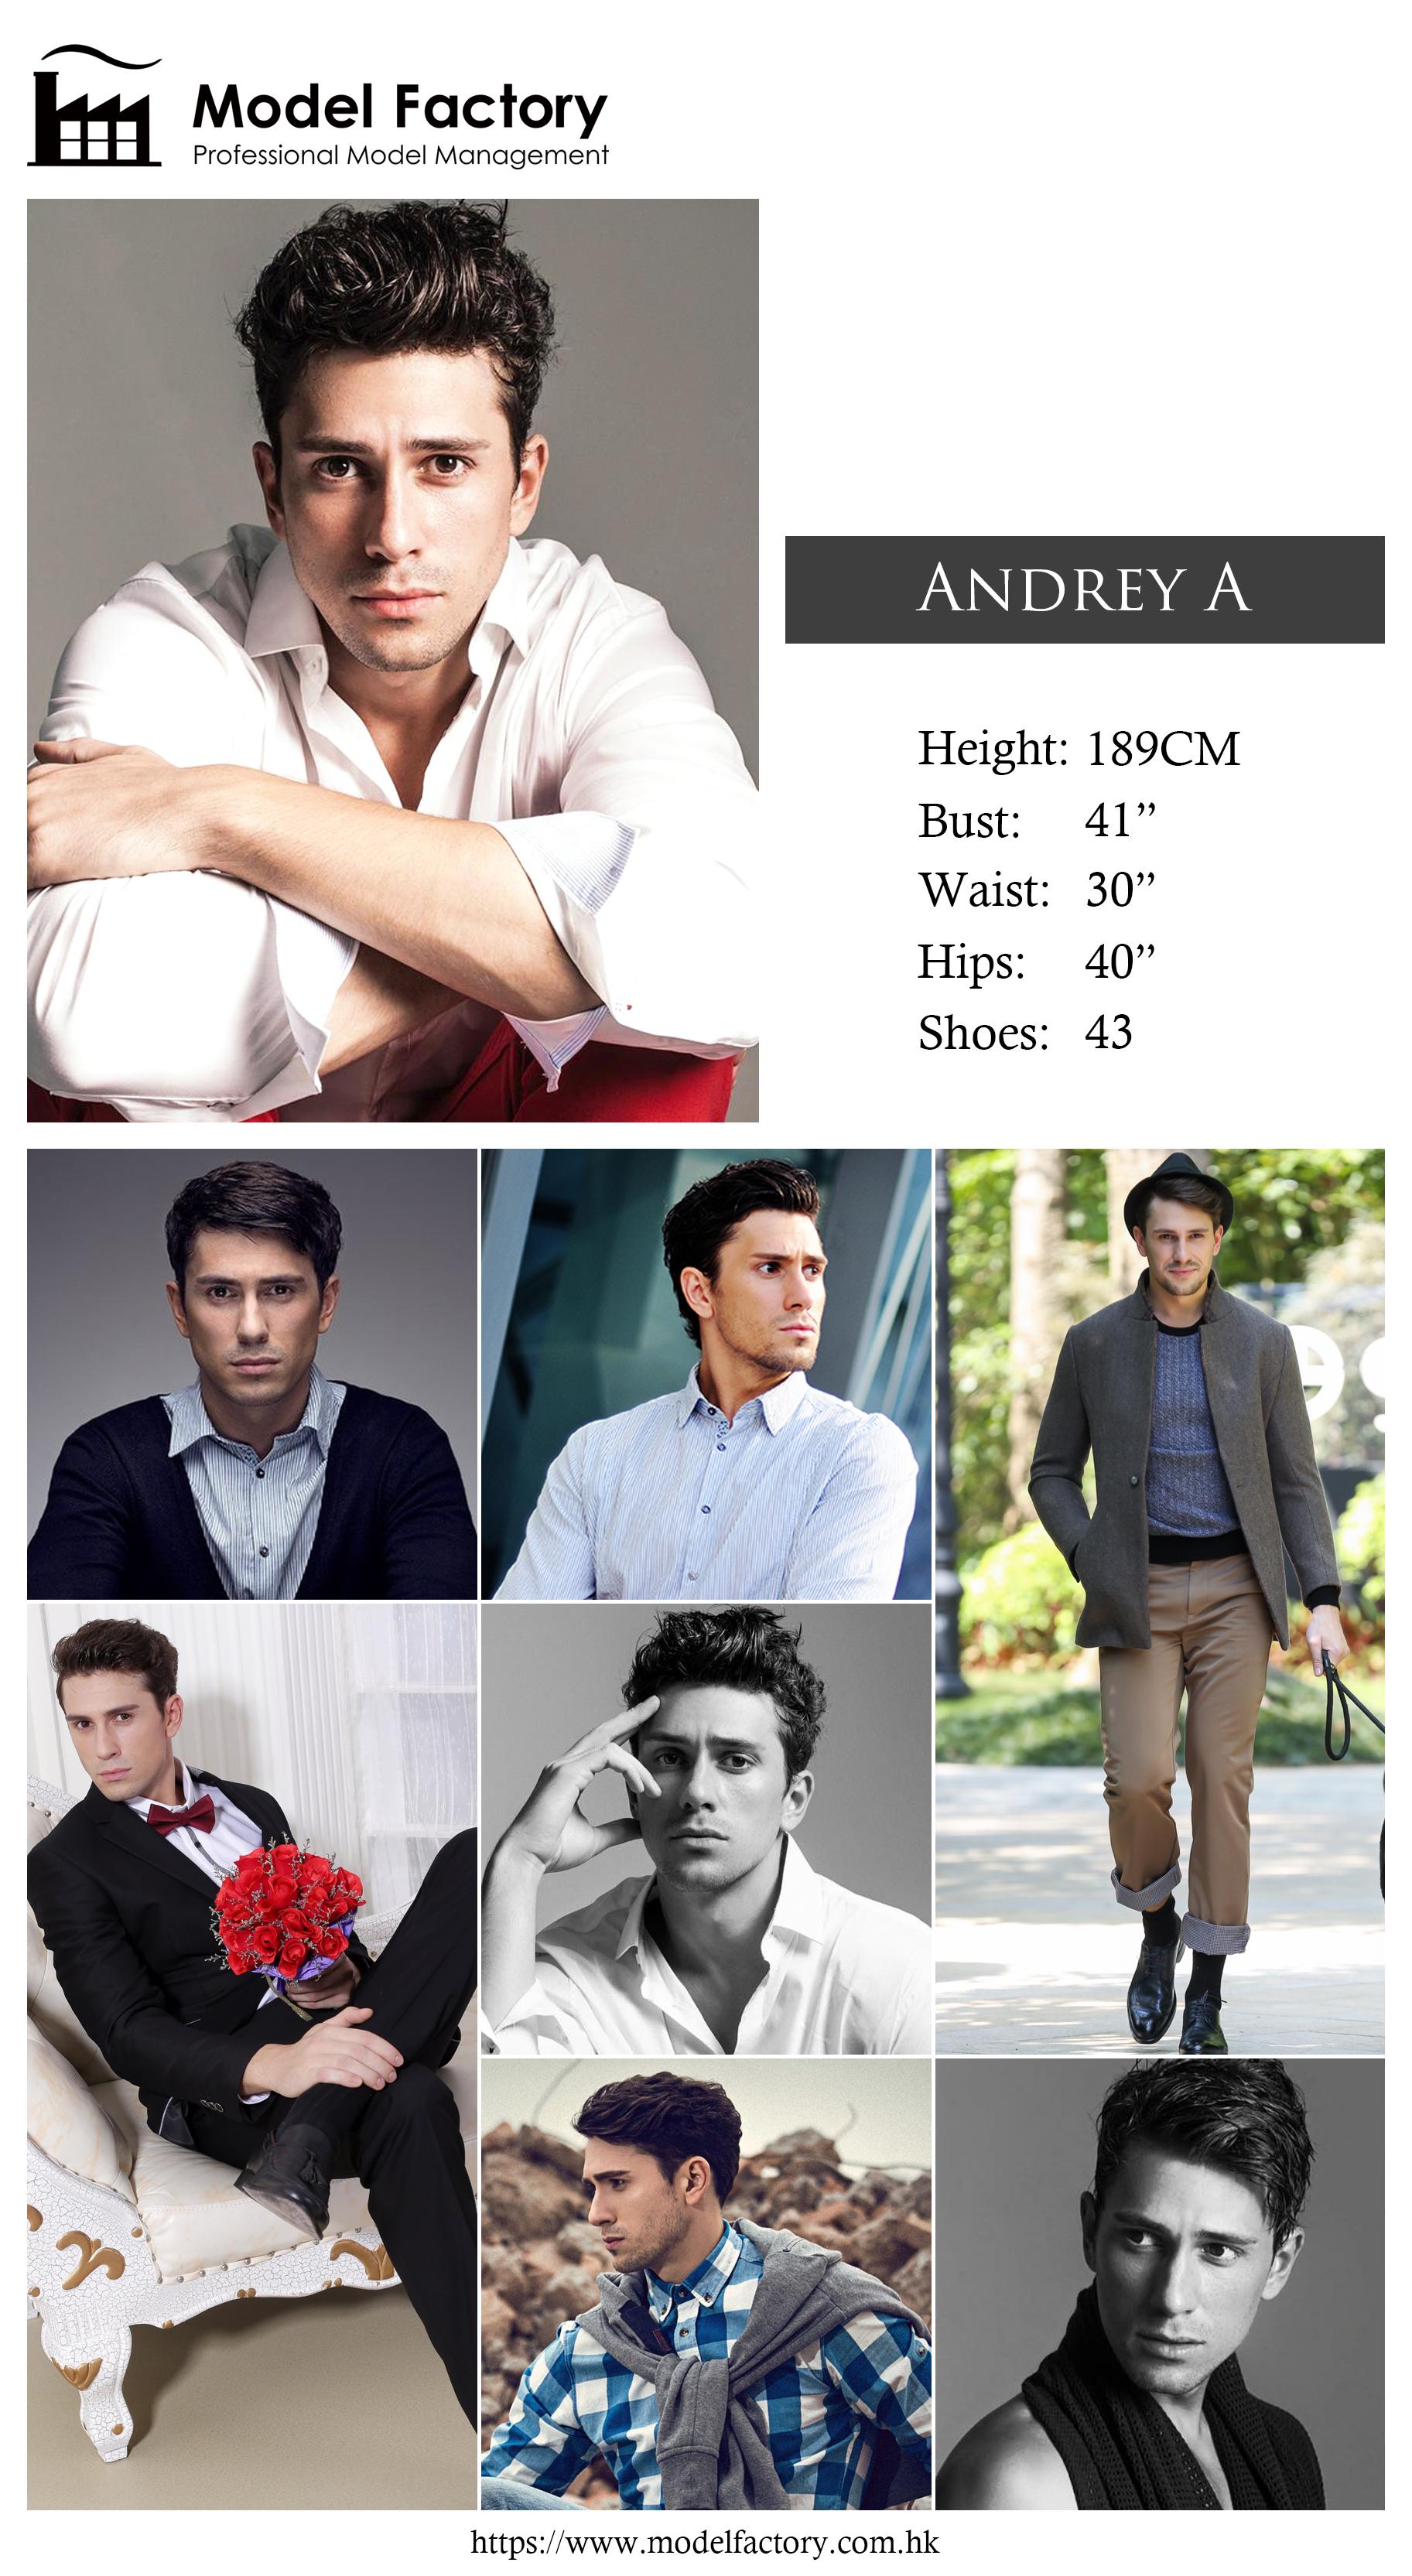 Model Factory Caucasian Male Model AndreyA